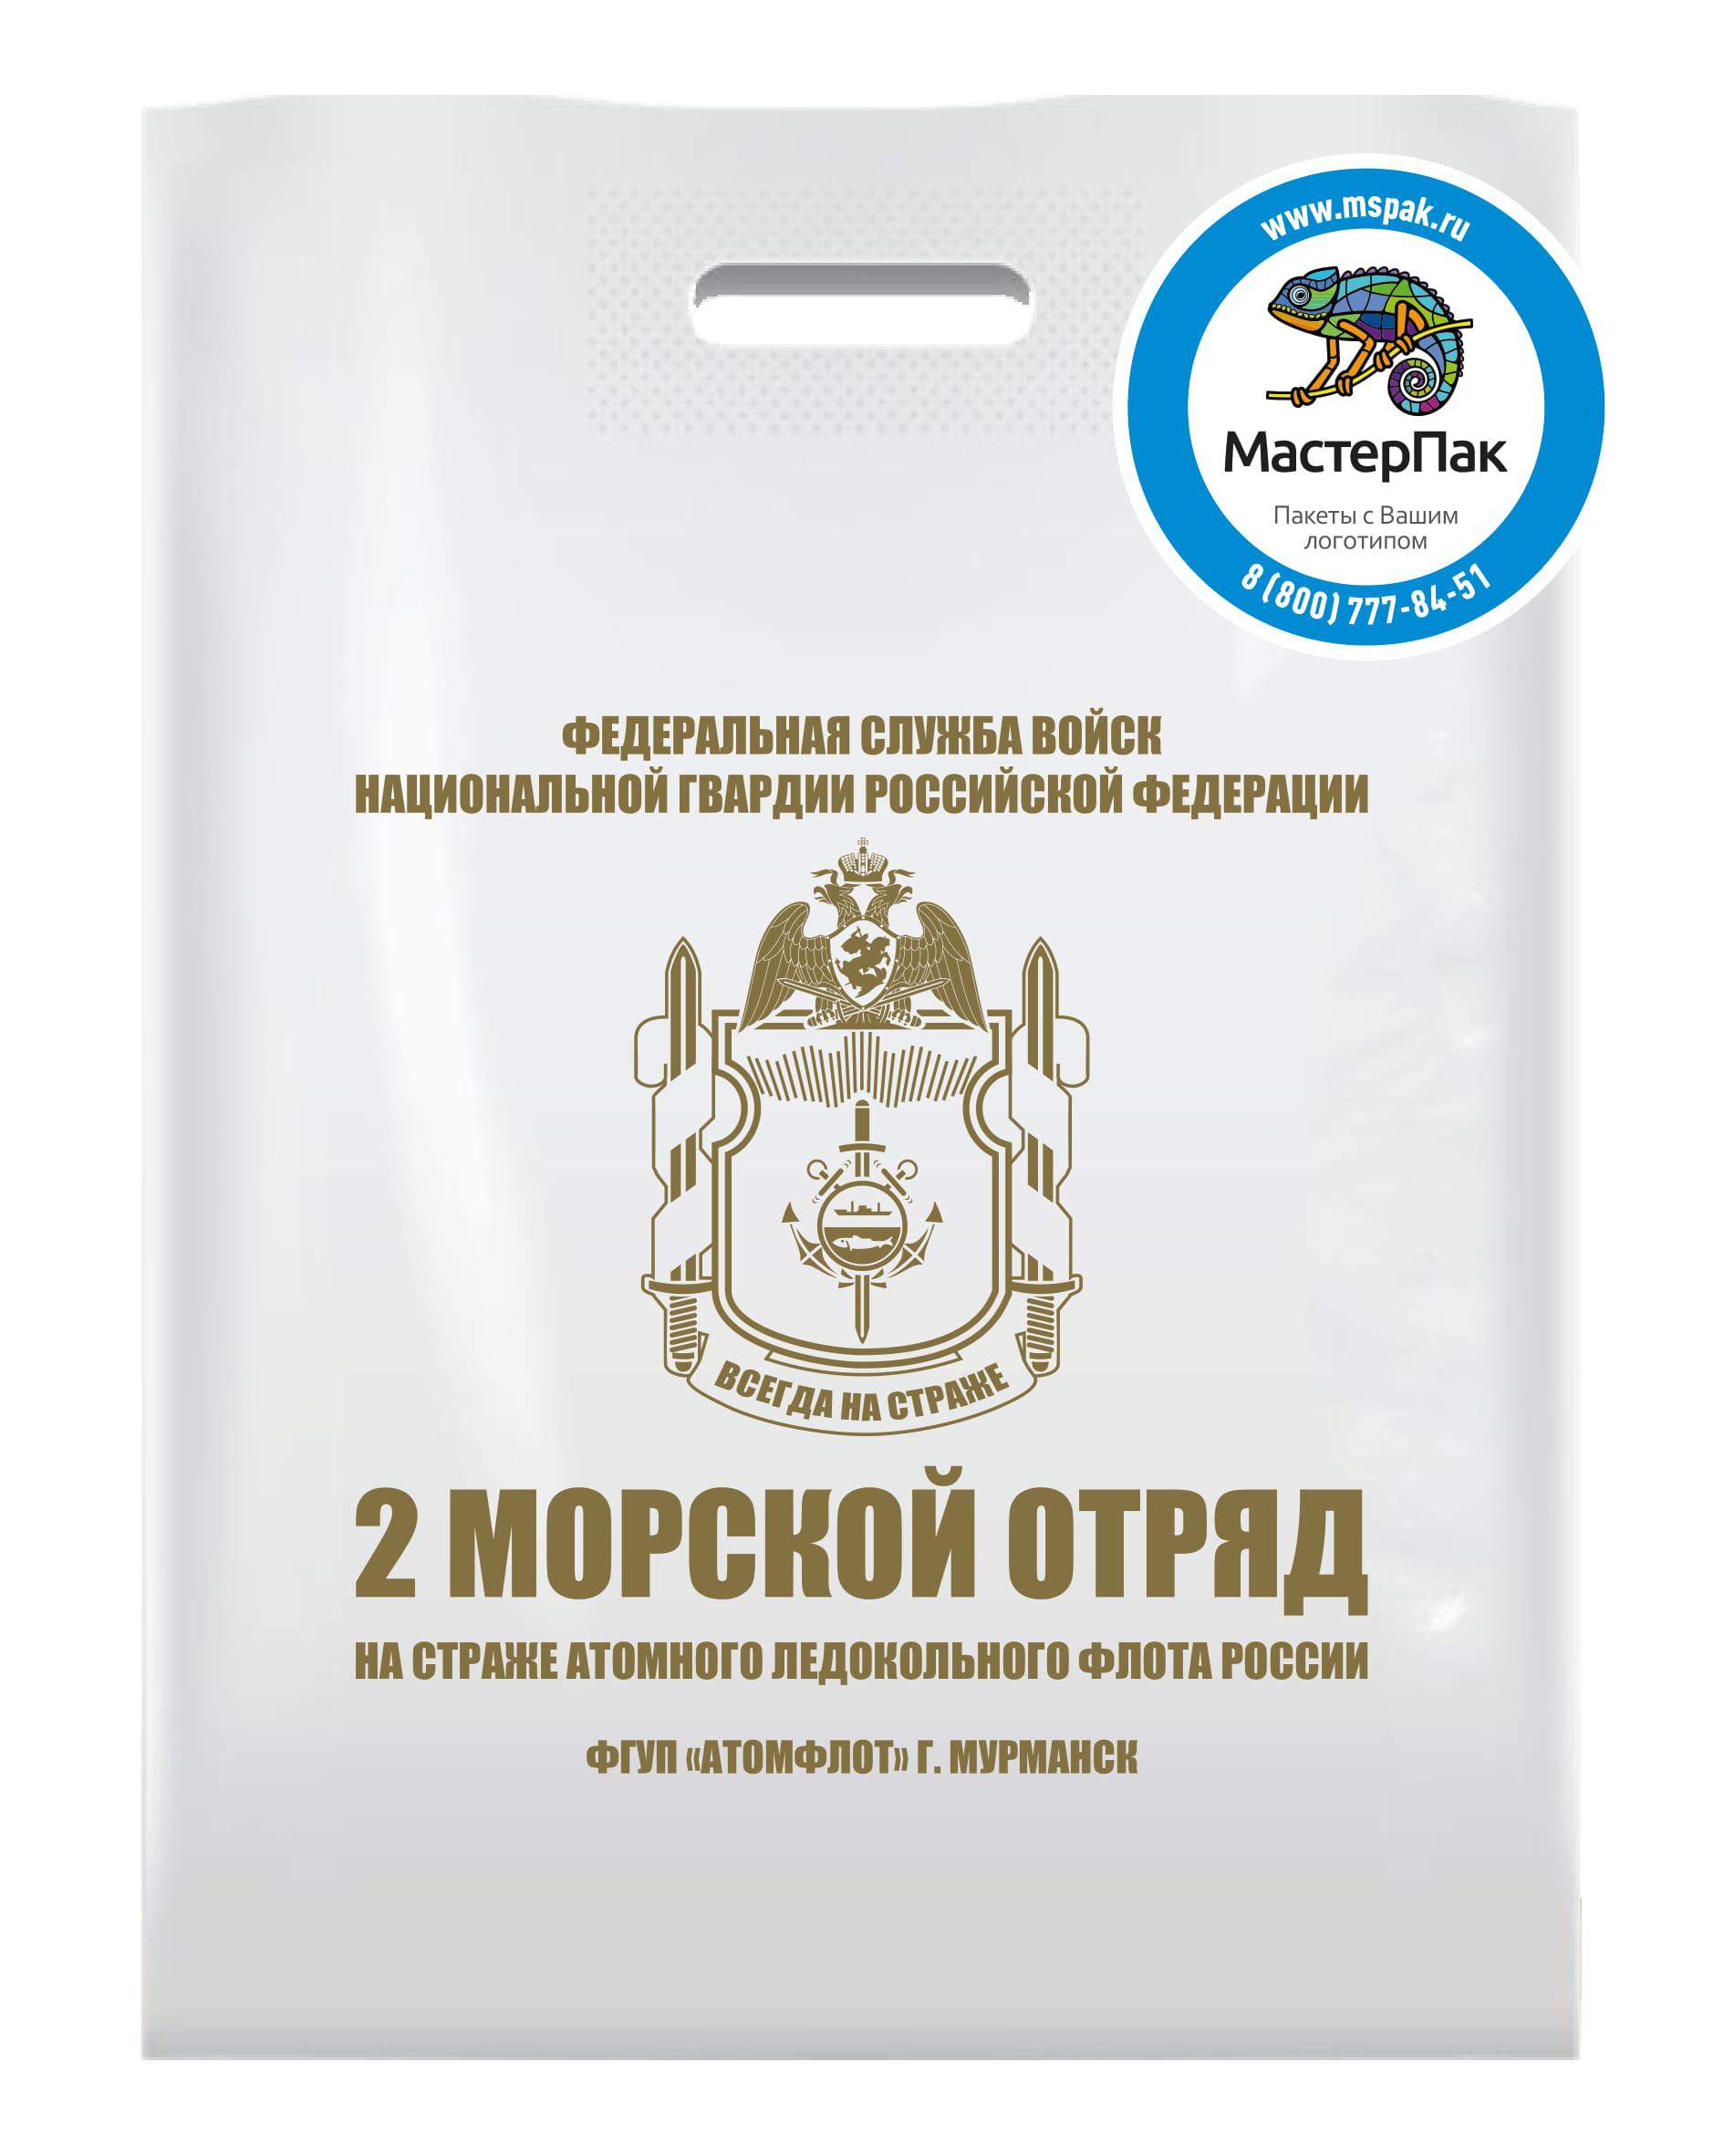 pakety8dop 01